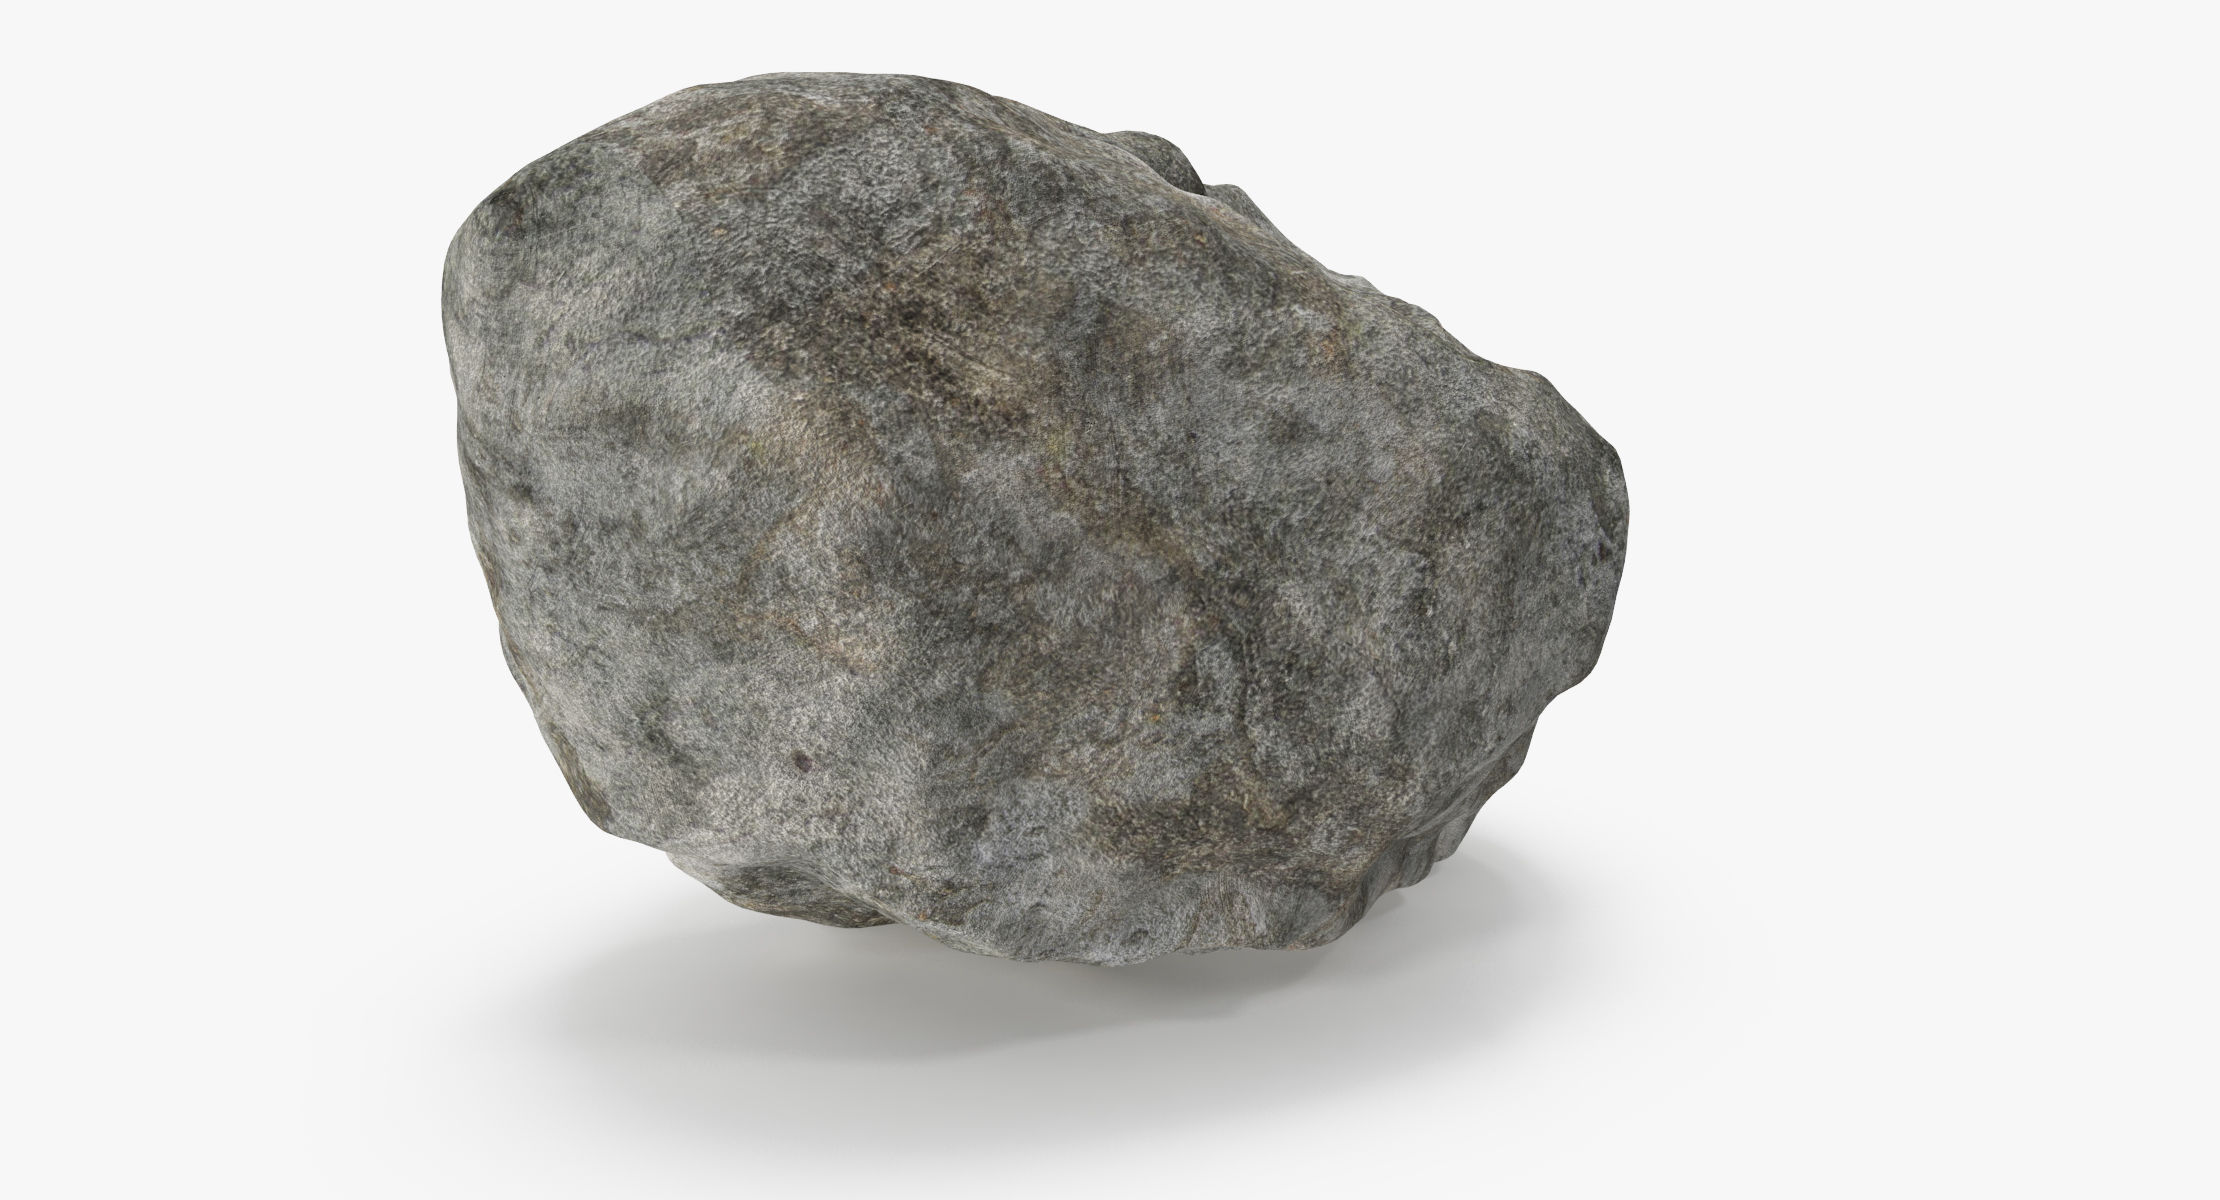 Rock 01 - reel 1